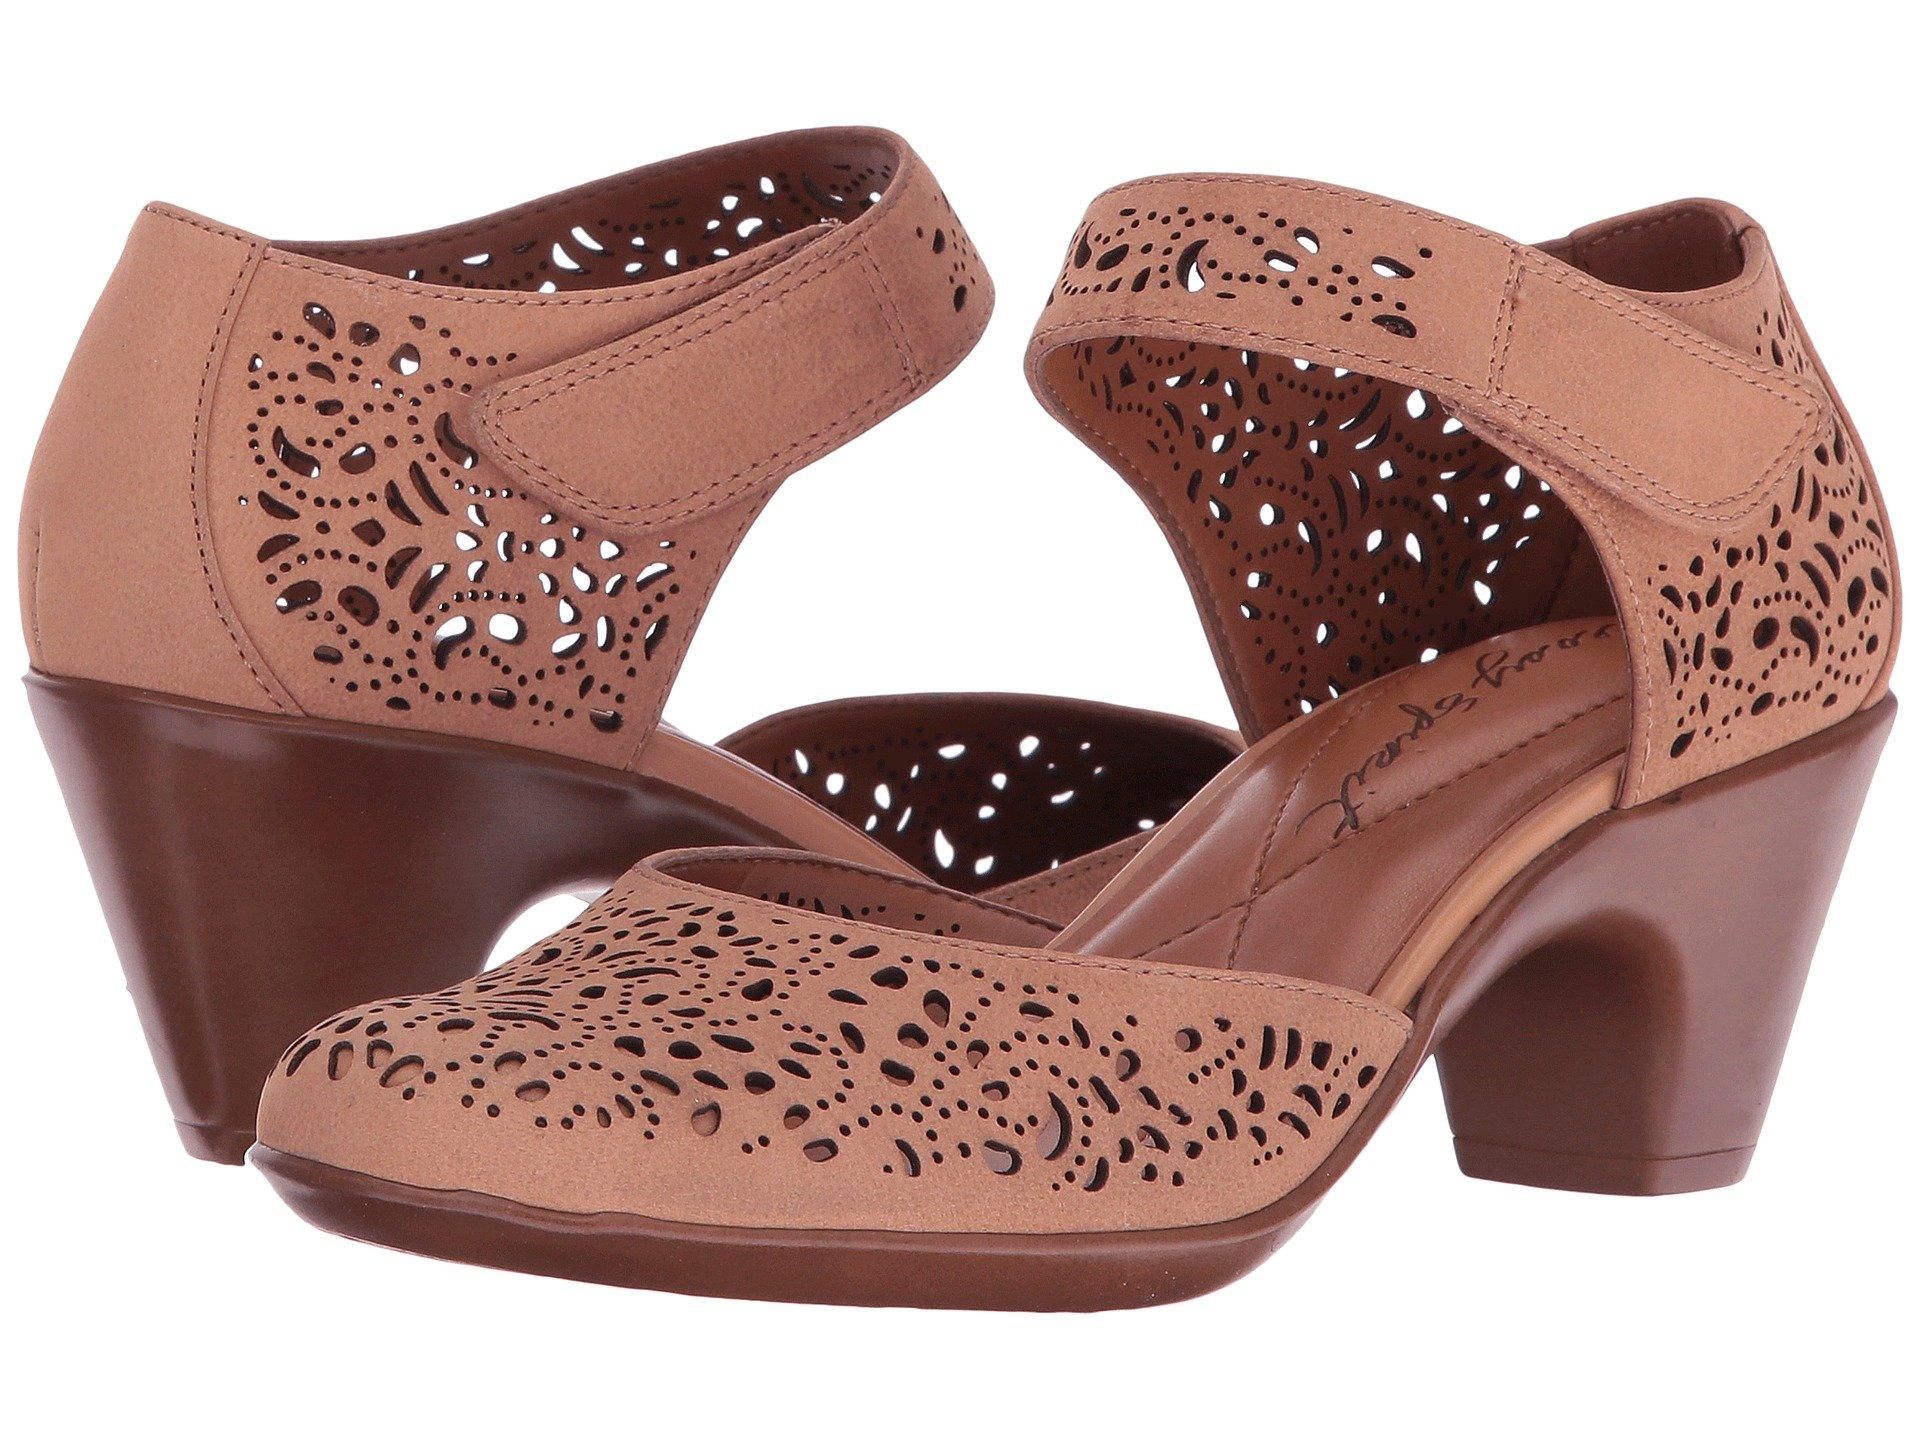 6b852c8c35ae6 Women s Easy Spirit Shoes + FREE SHIPPING